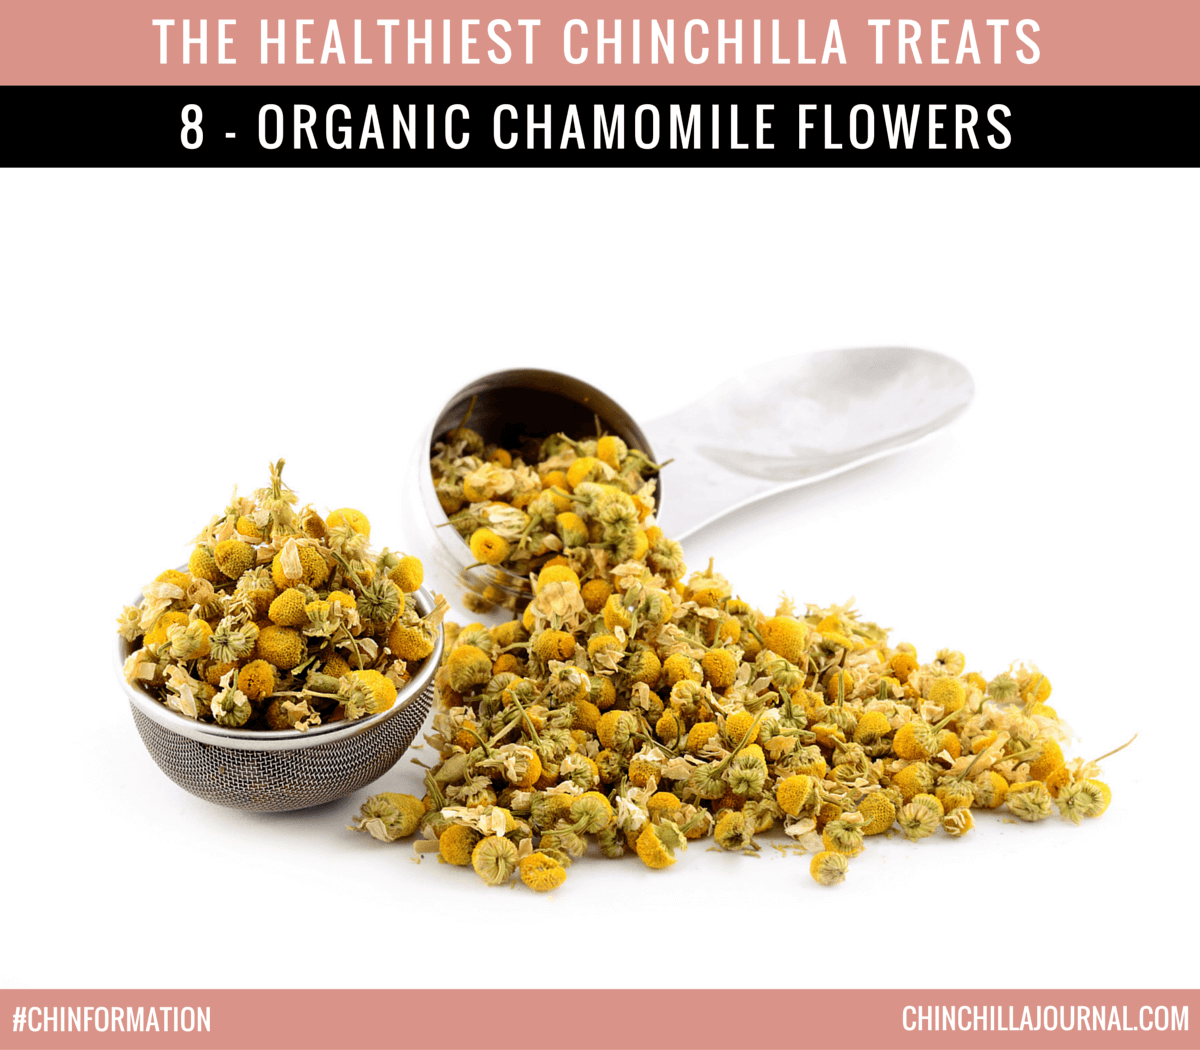 The Healthiest Chinchilla Treats - 8 - Organic Chamomile Flowers